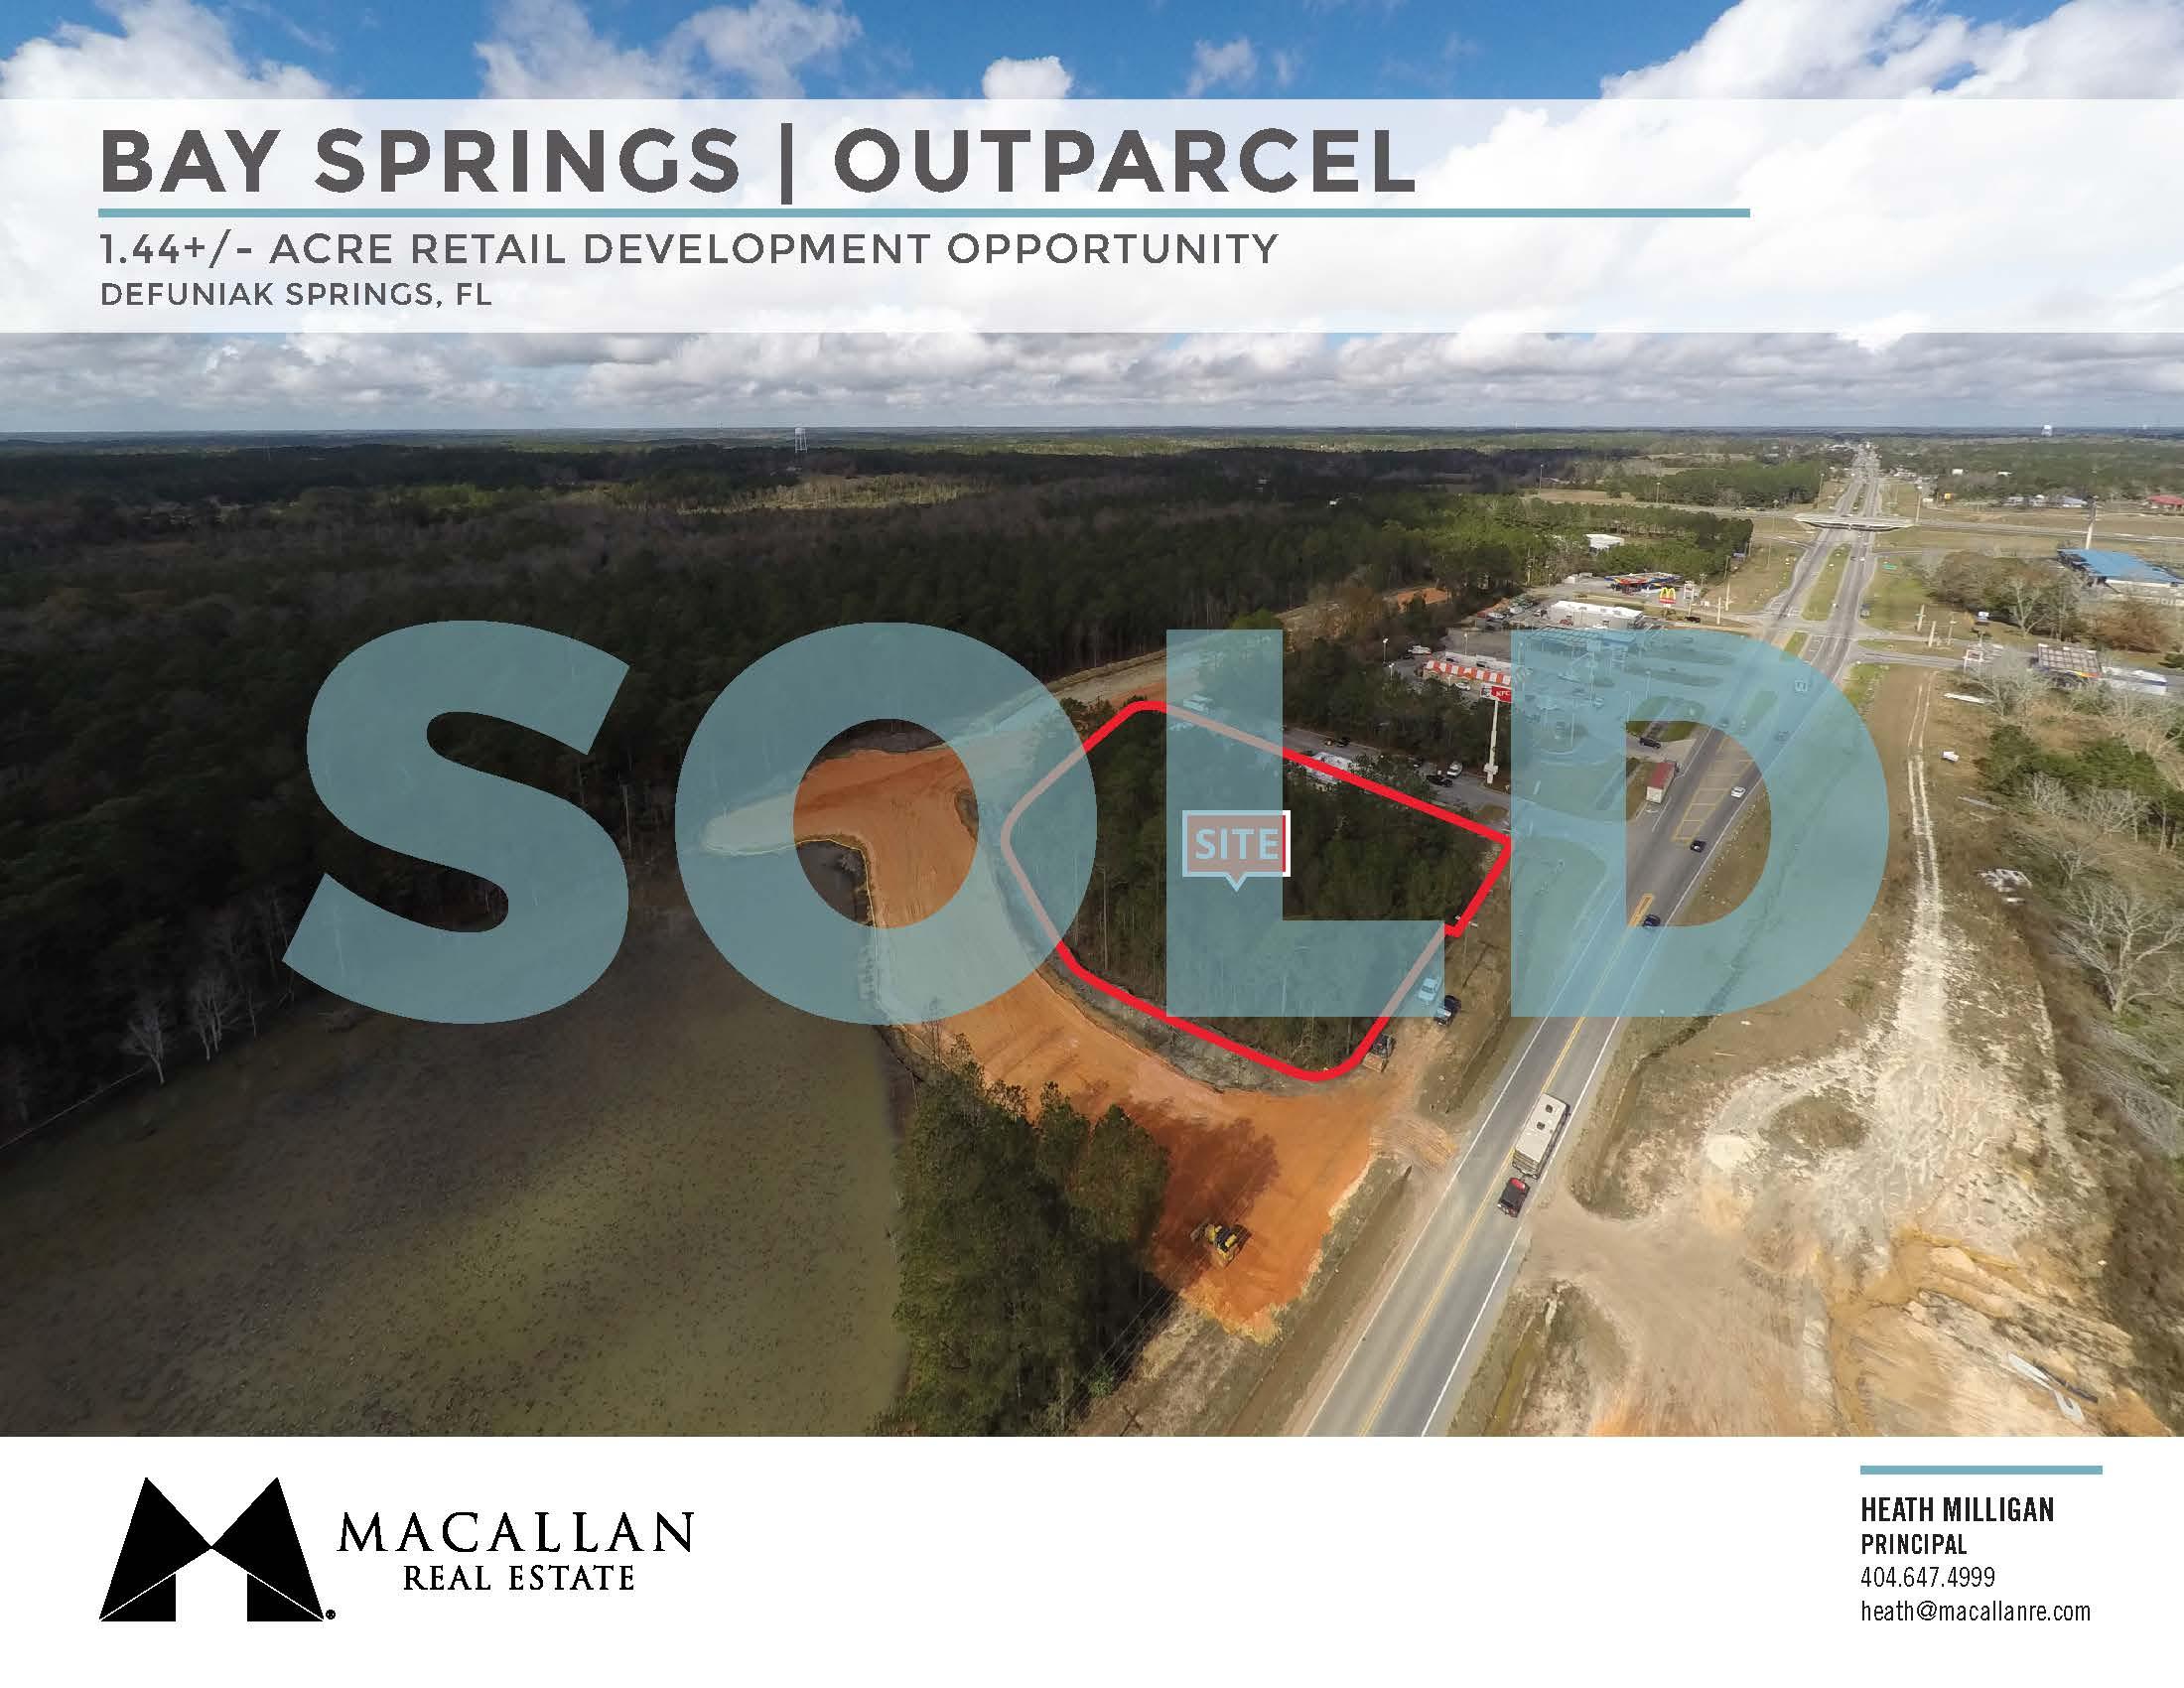 DeFuniak-Springs-Outparcel-3.16.18-SOLD.jpg